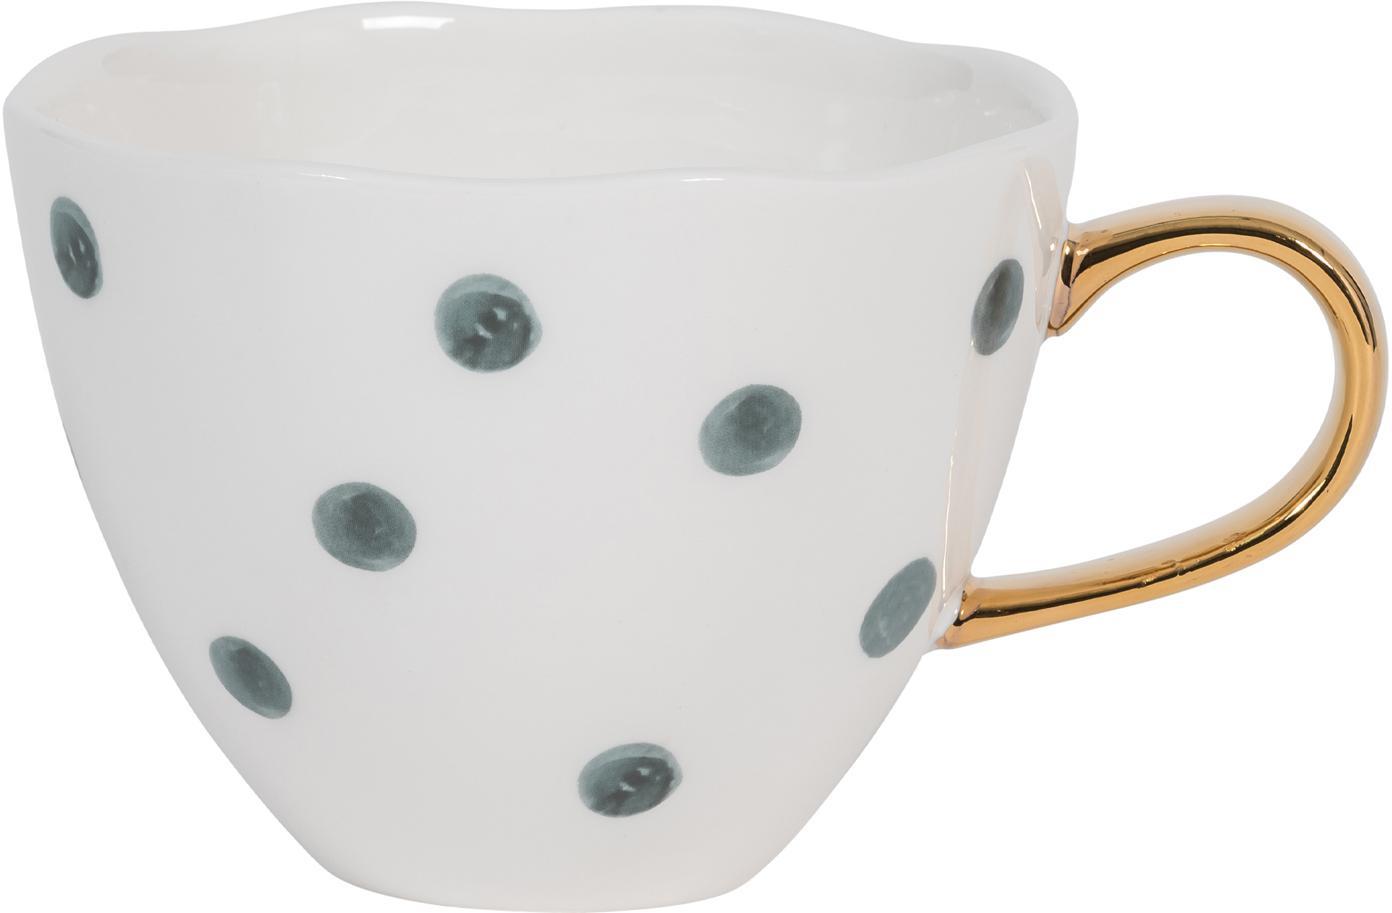 Kopje Good Morning met goudkleurige handvat, New Bone China, Wit, blauw, Ø 11 x H 8 cm